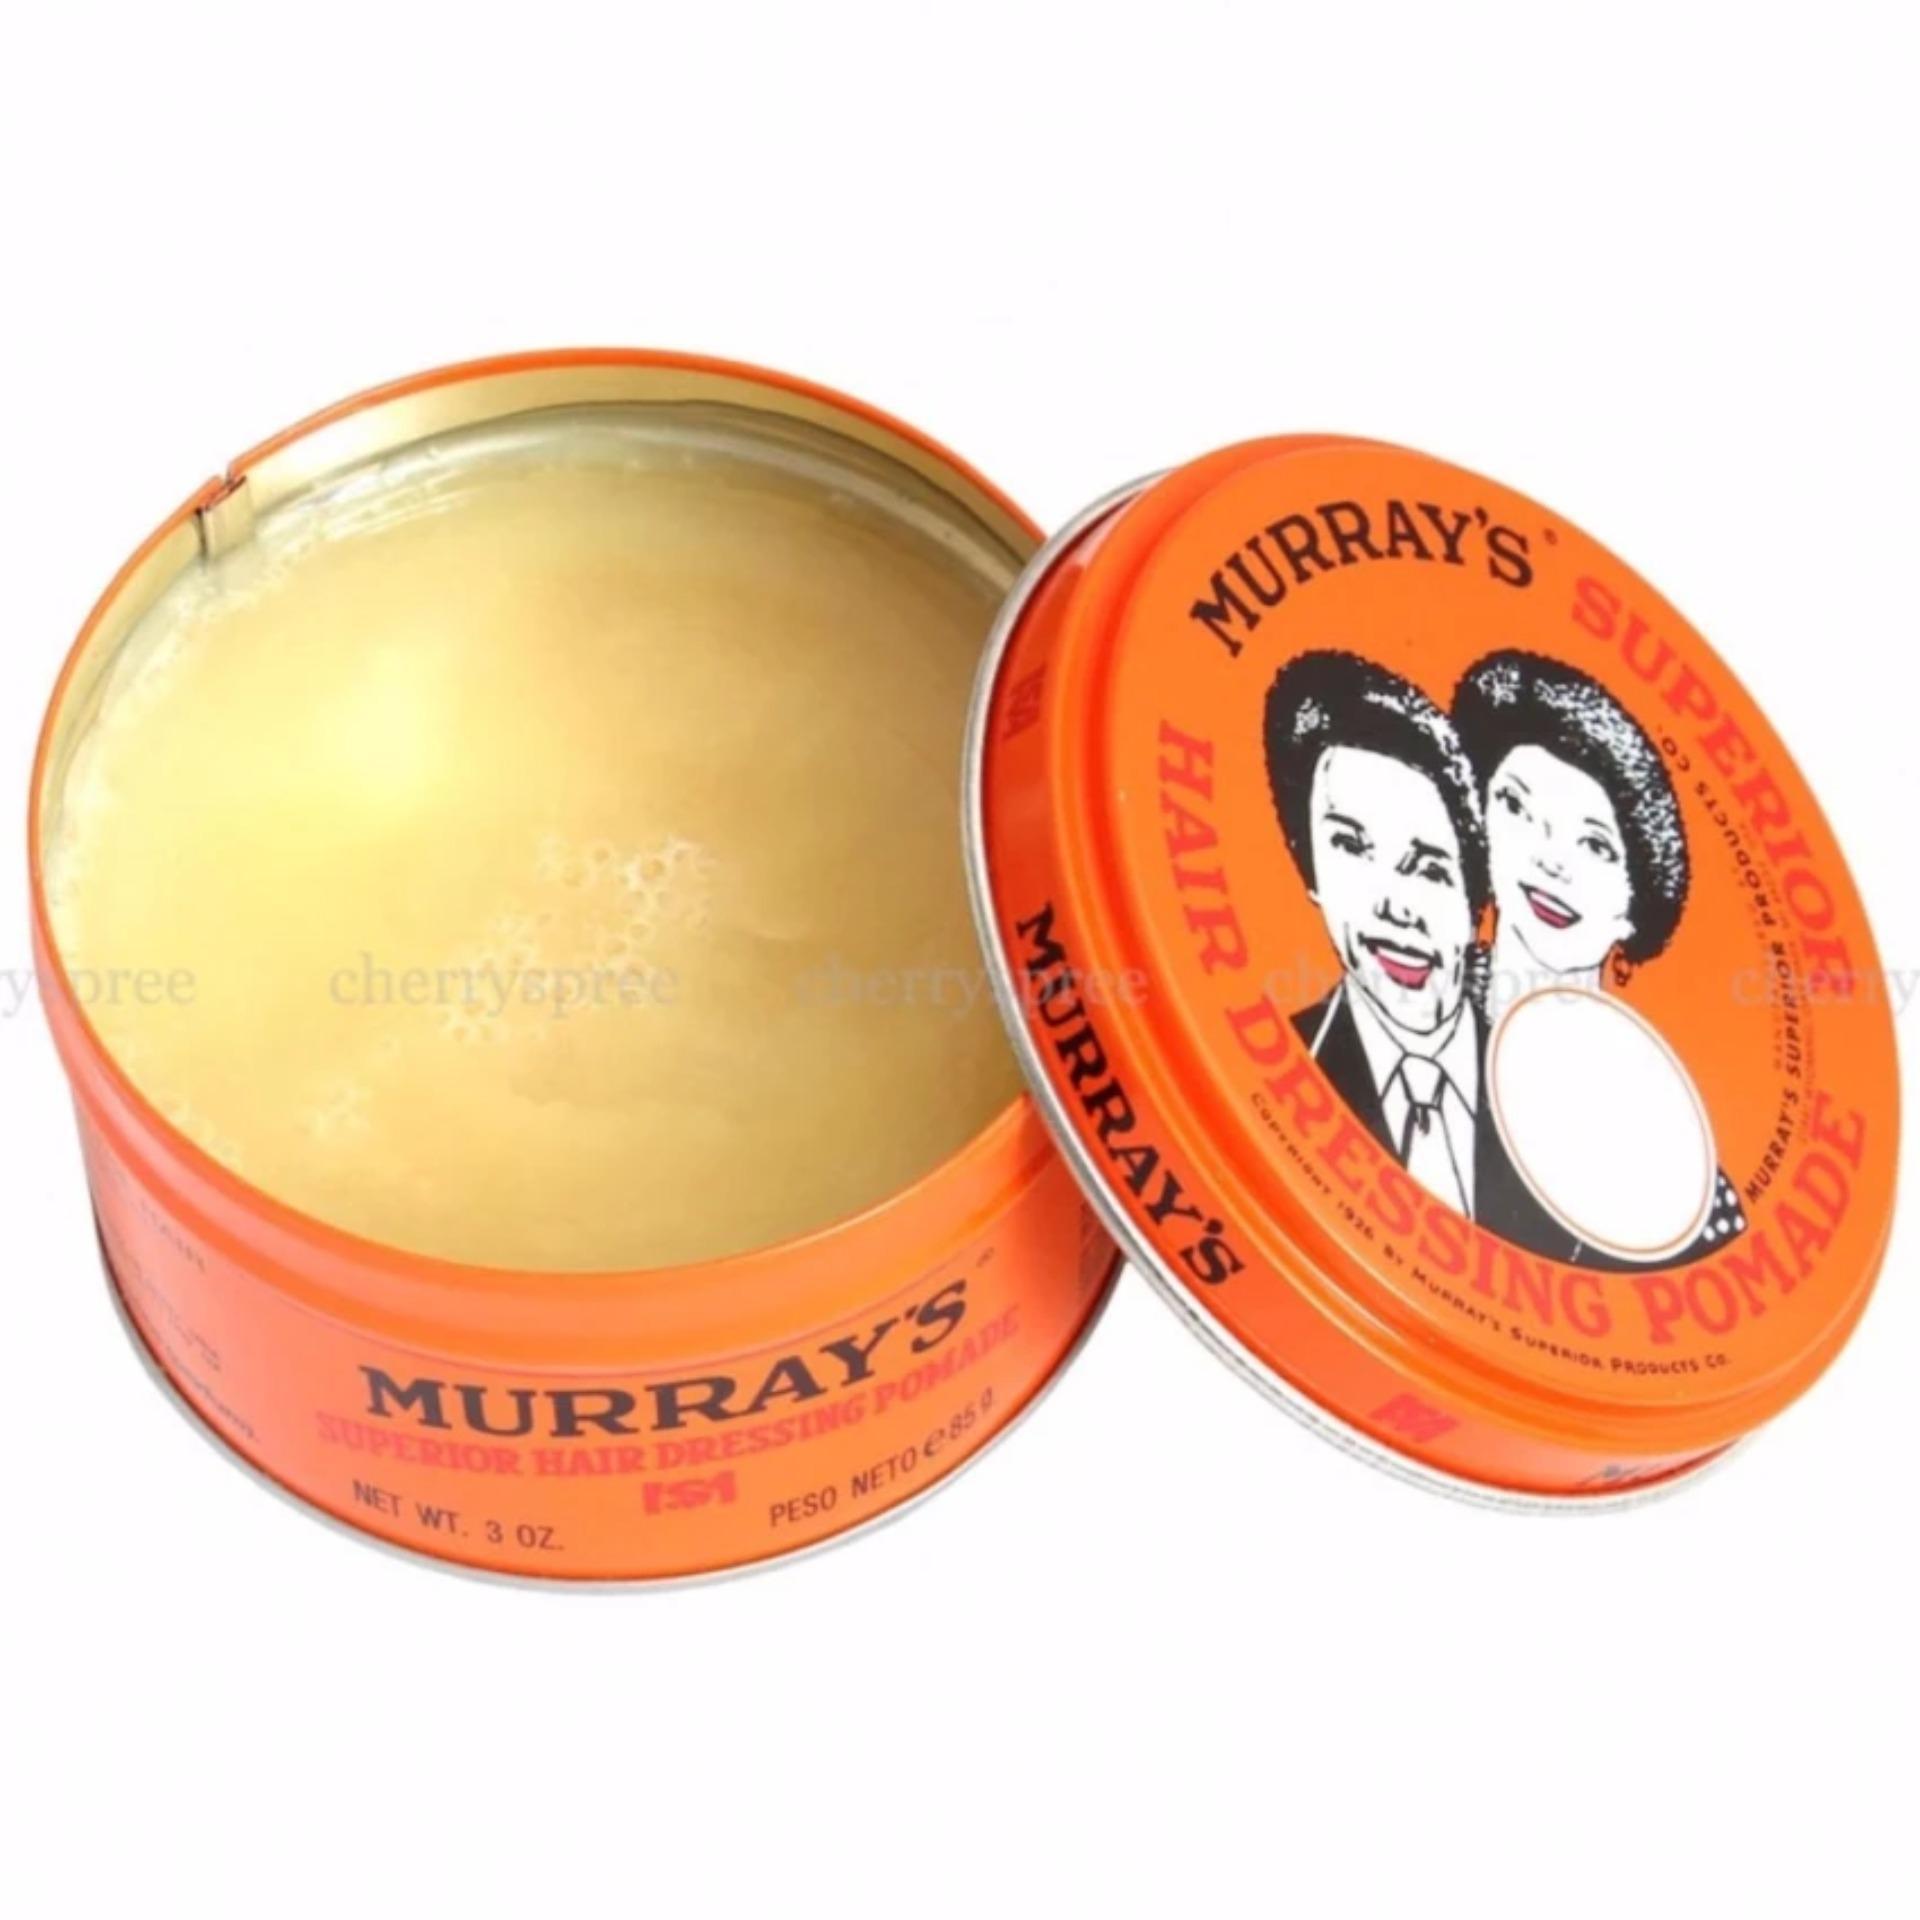 ... Pomade Murray's Superior 3 Oz Heavy Oilbased Hair Dressing Pomade/ Oil Based Paling Keras Strong ...